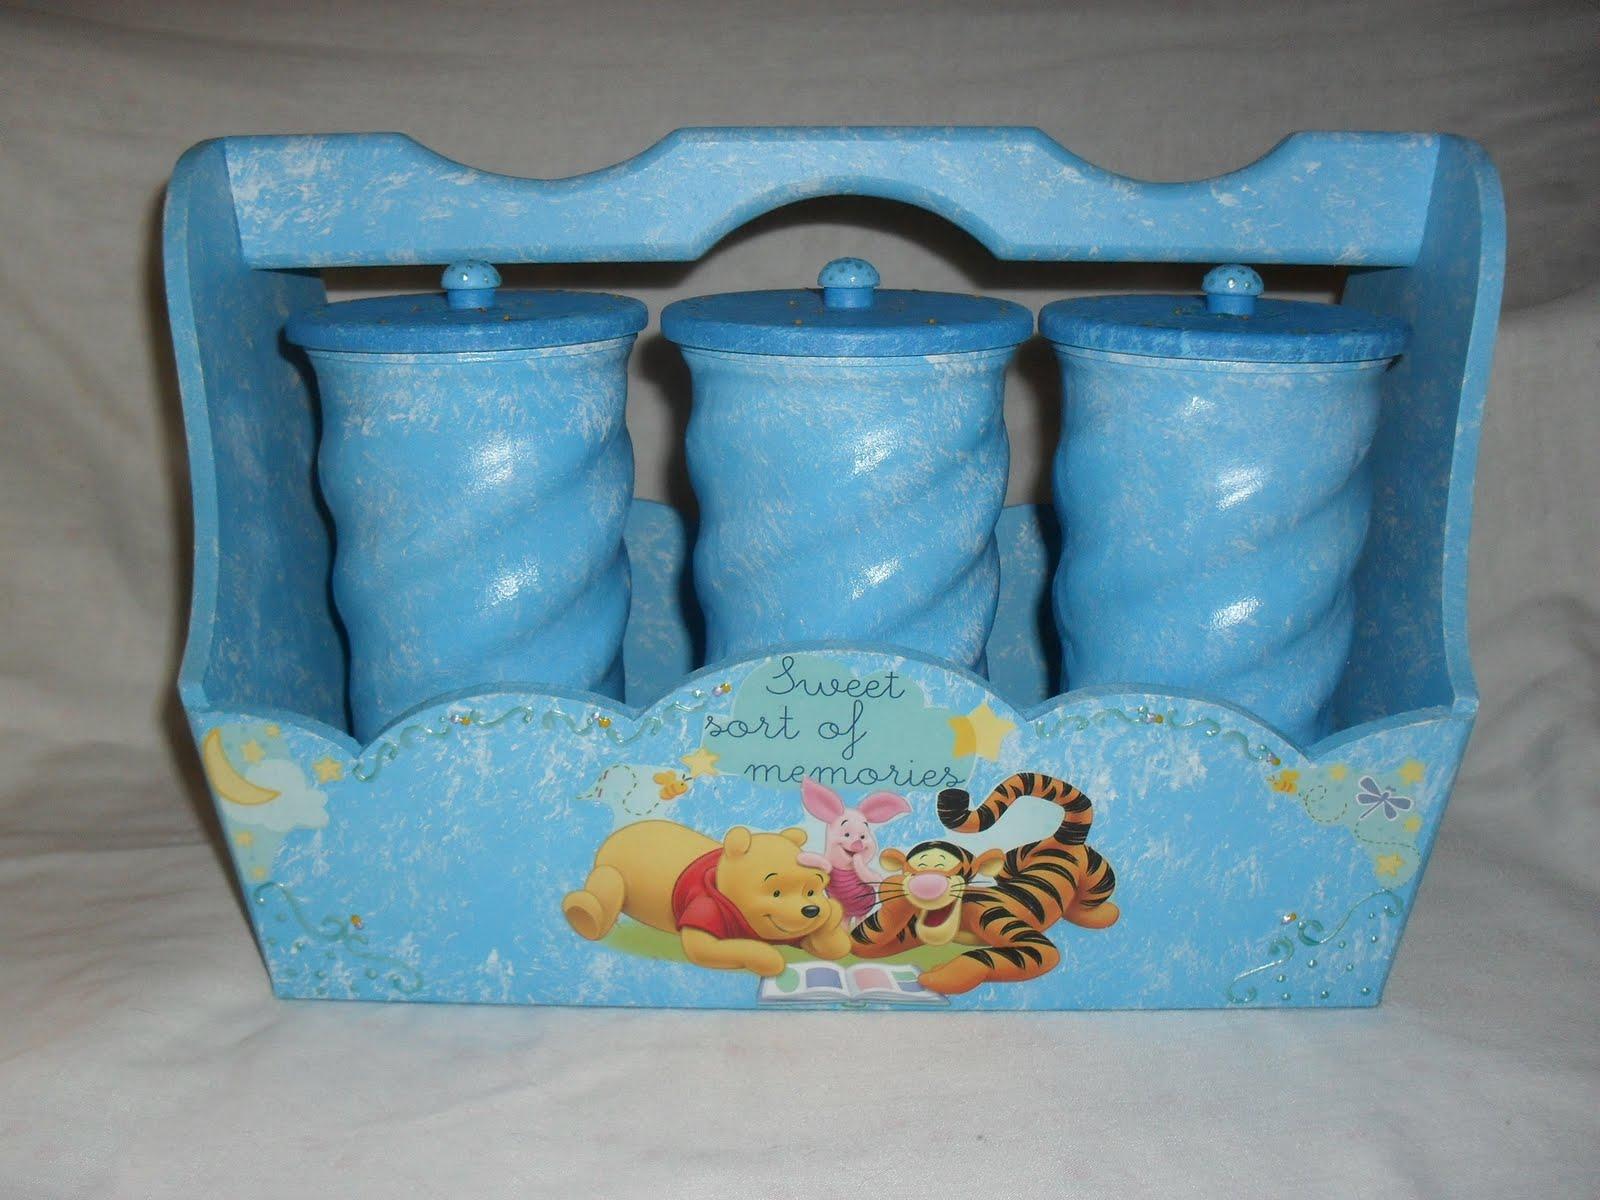 Aparador Antigo Laqueado ~ Meninas Usemann Artesanatos Kit higiene Pooh e amigos